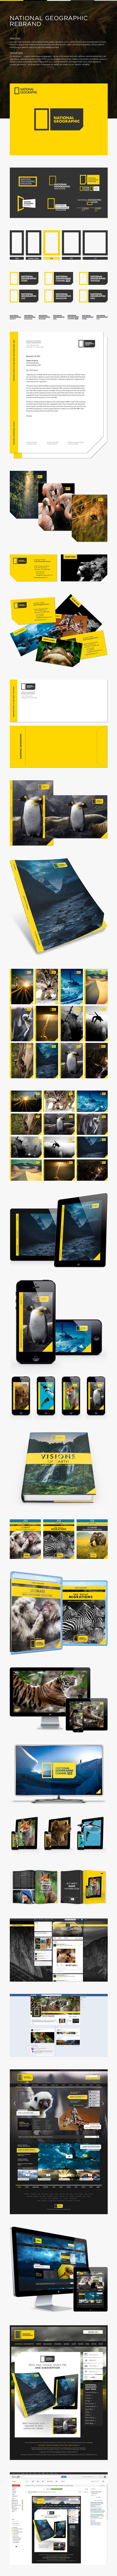 National Geographic branding